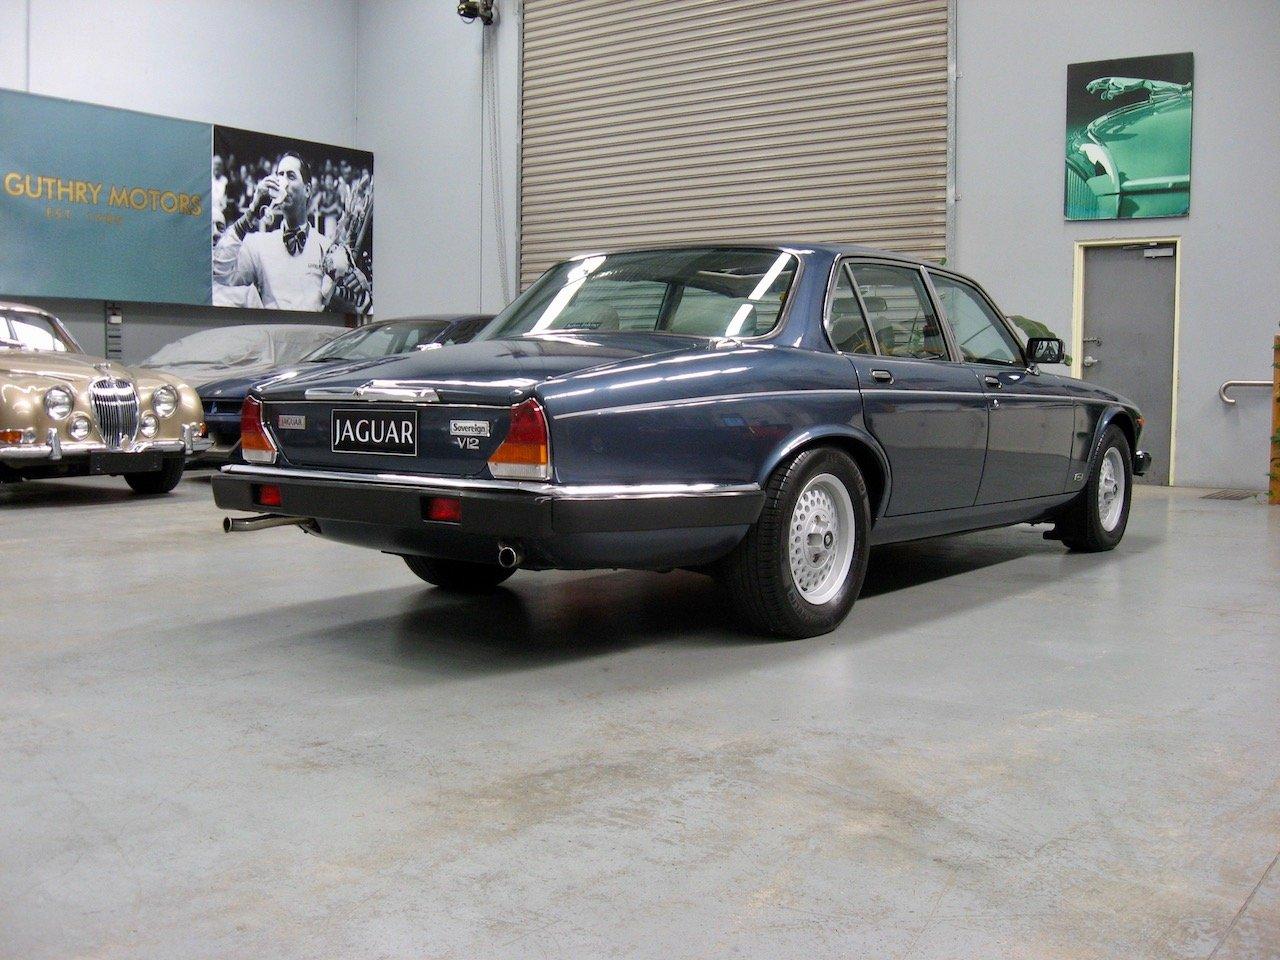 1987 Jaguar XJ12 Series 3 Sovereign V12 For Sale (picture 3 of 6)